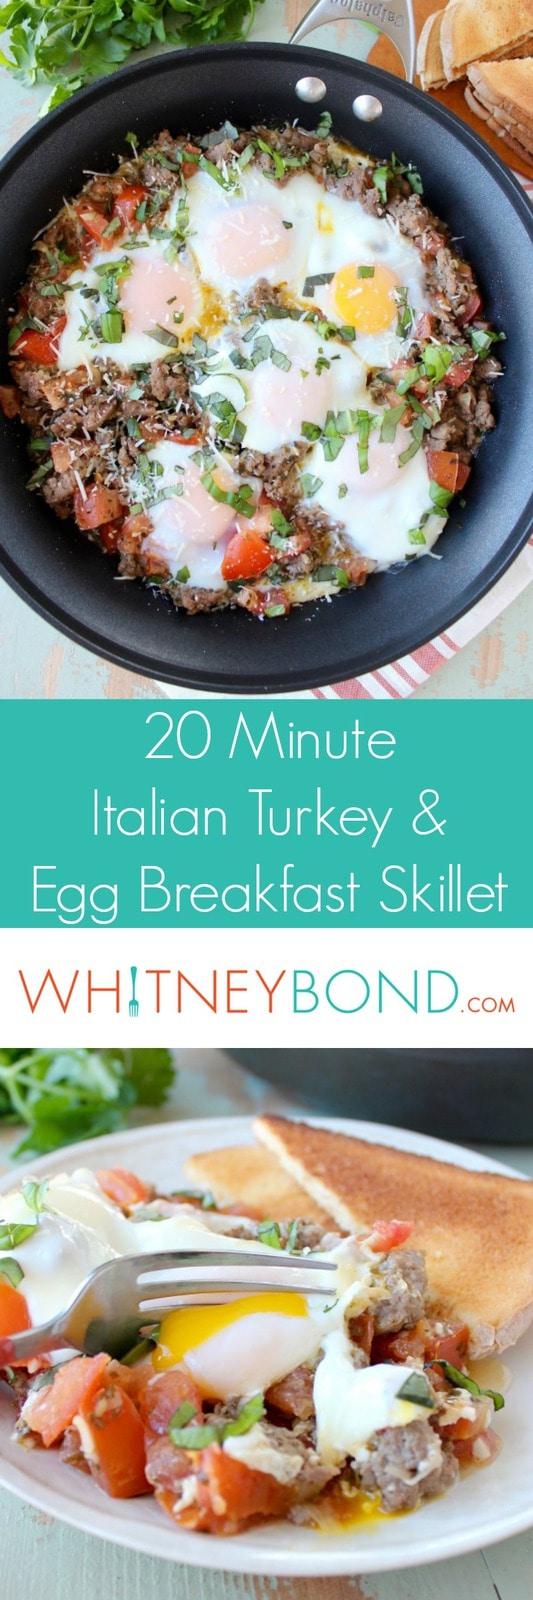 20 Minute Italian Turkey Sausage & Egg Breakfast Skillet Recipe